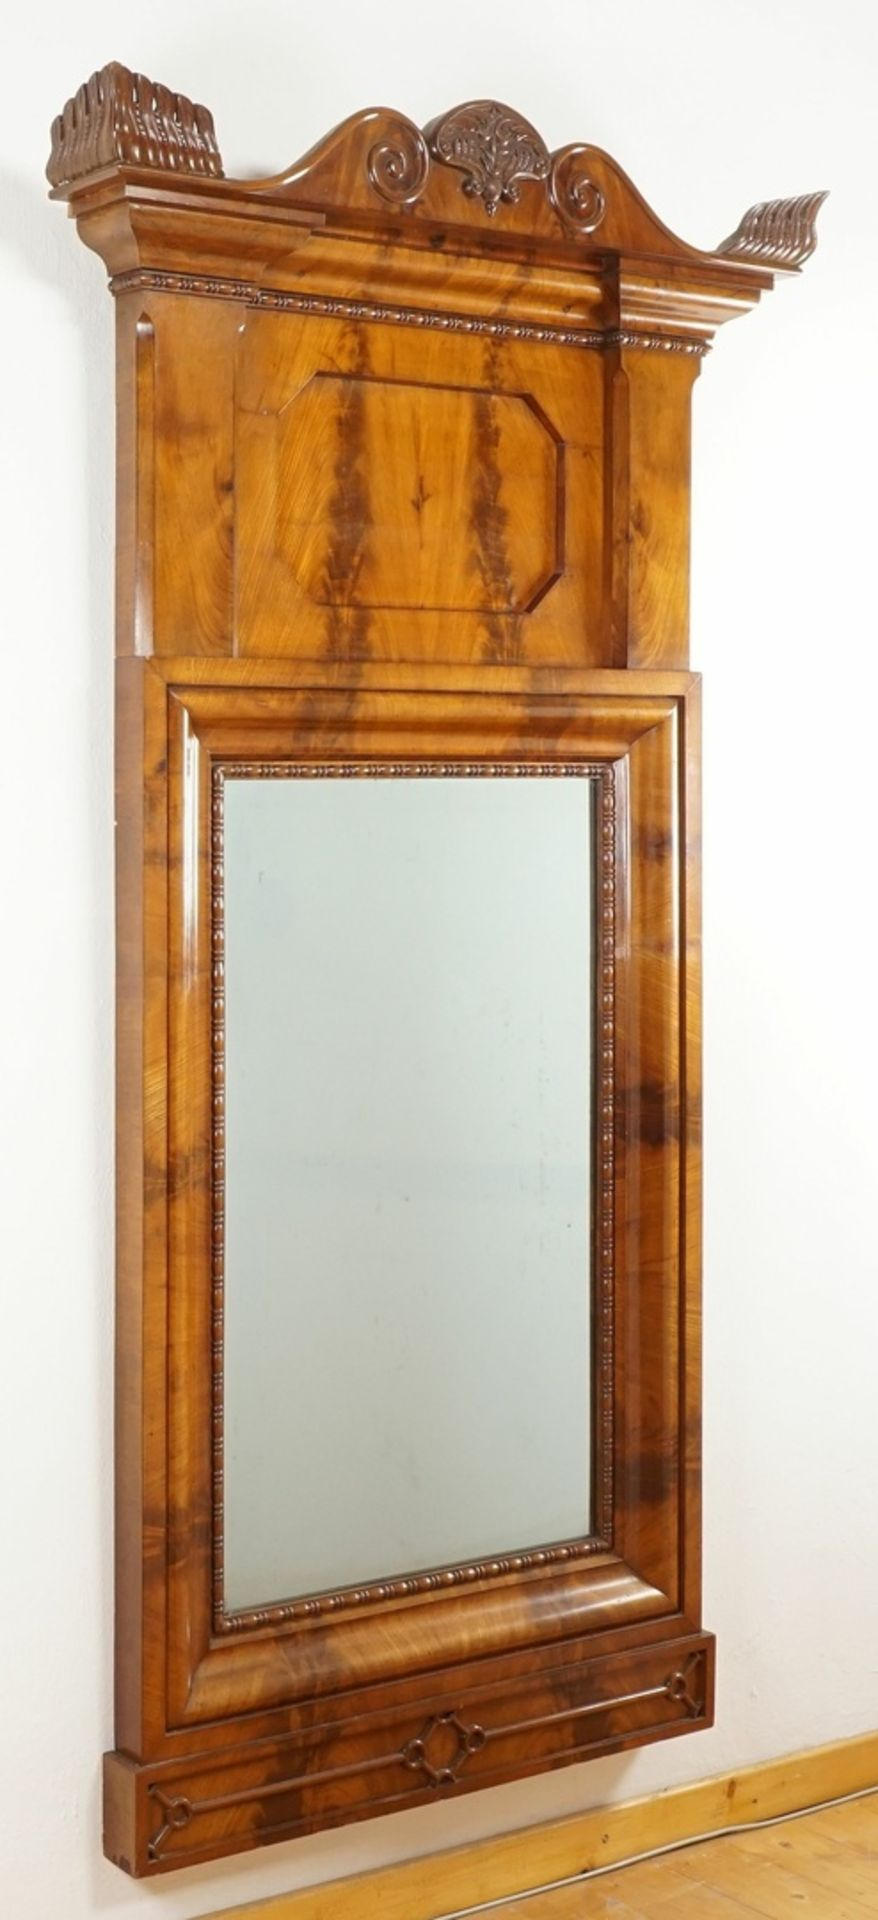 Großer reich verzierter Spiegel, Mahagoni furniert